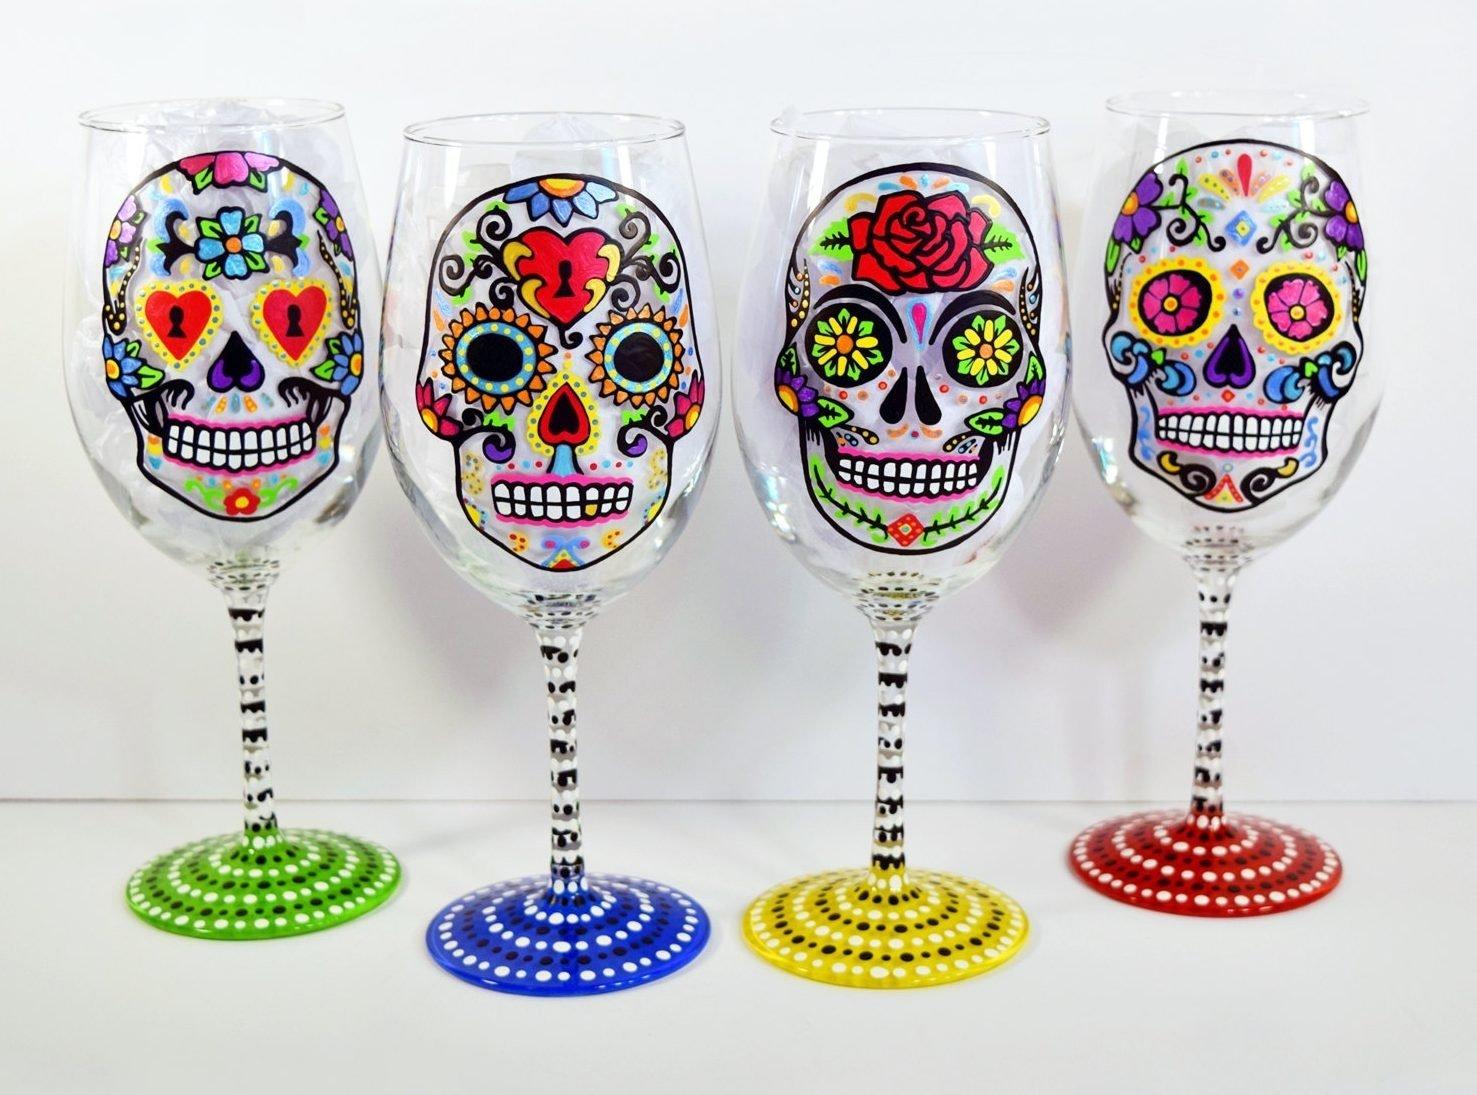 10 Cute Ideas For Painting Wine Glasses 100 fun and amazing unique wine glasses decor snob 2021